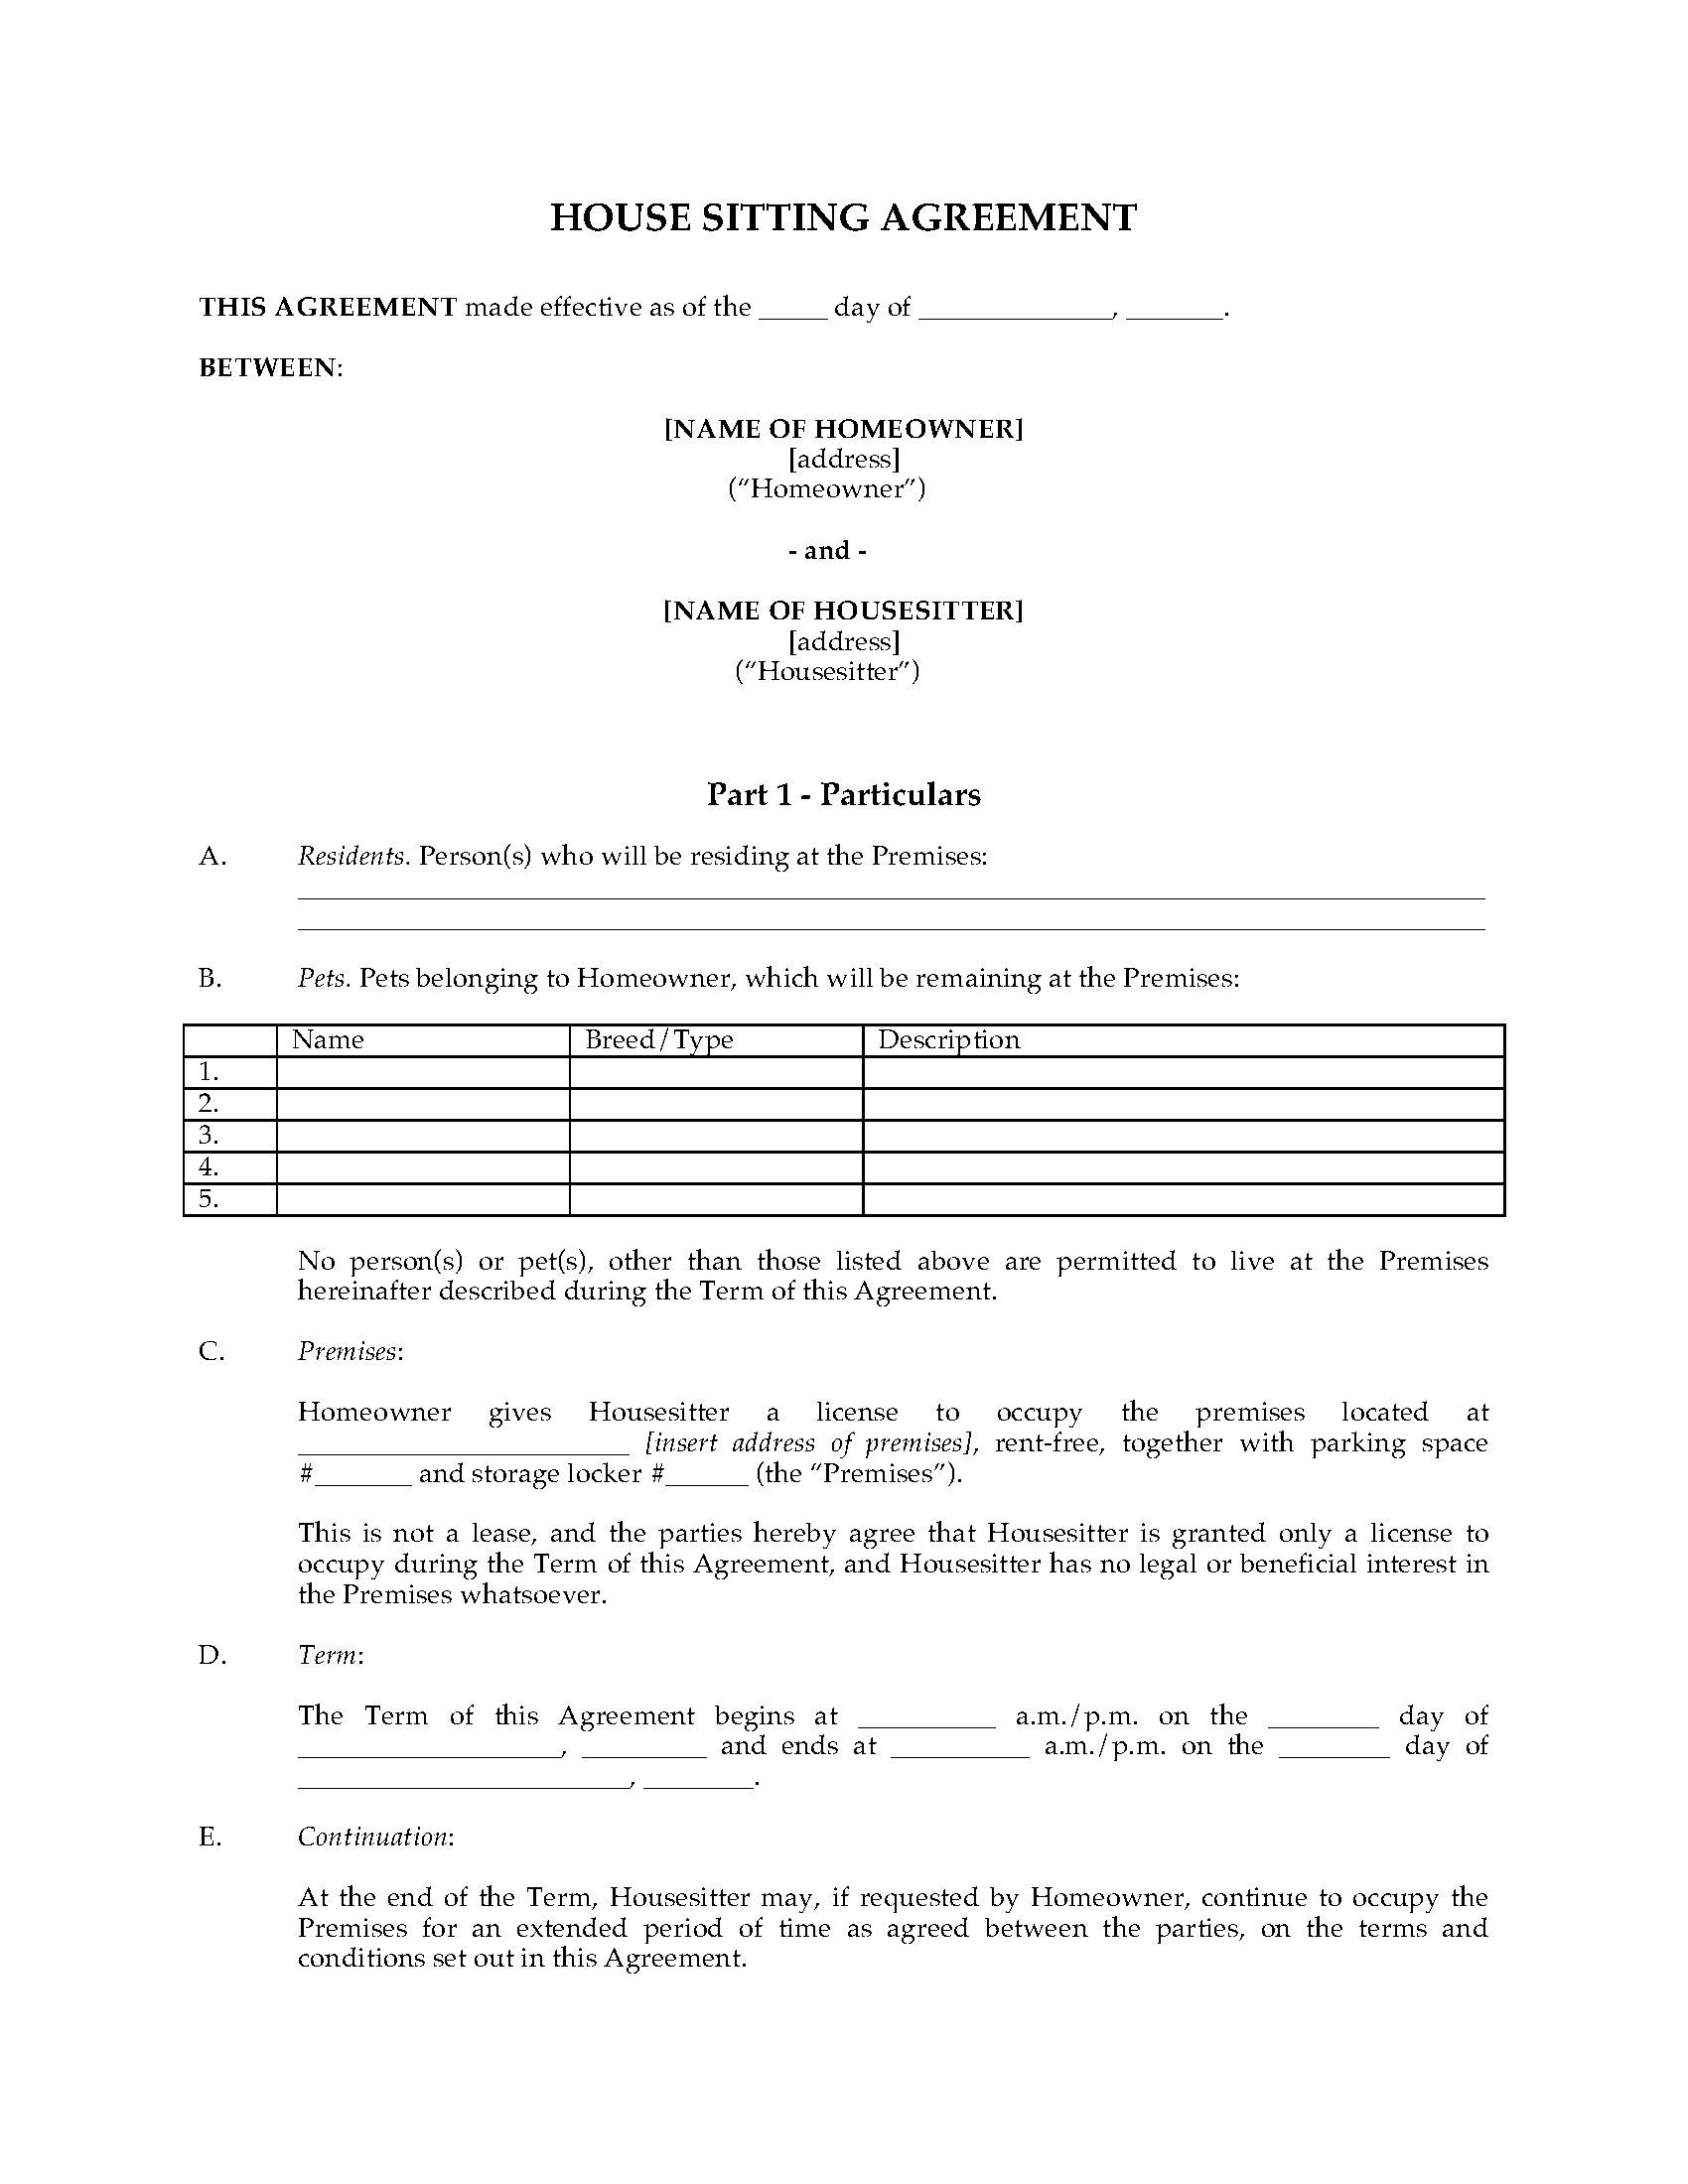 House Sitting Agreement